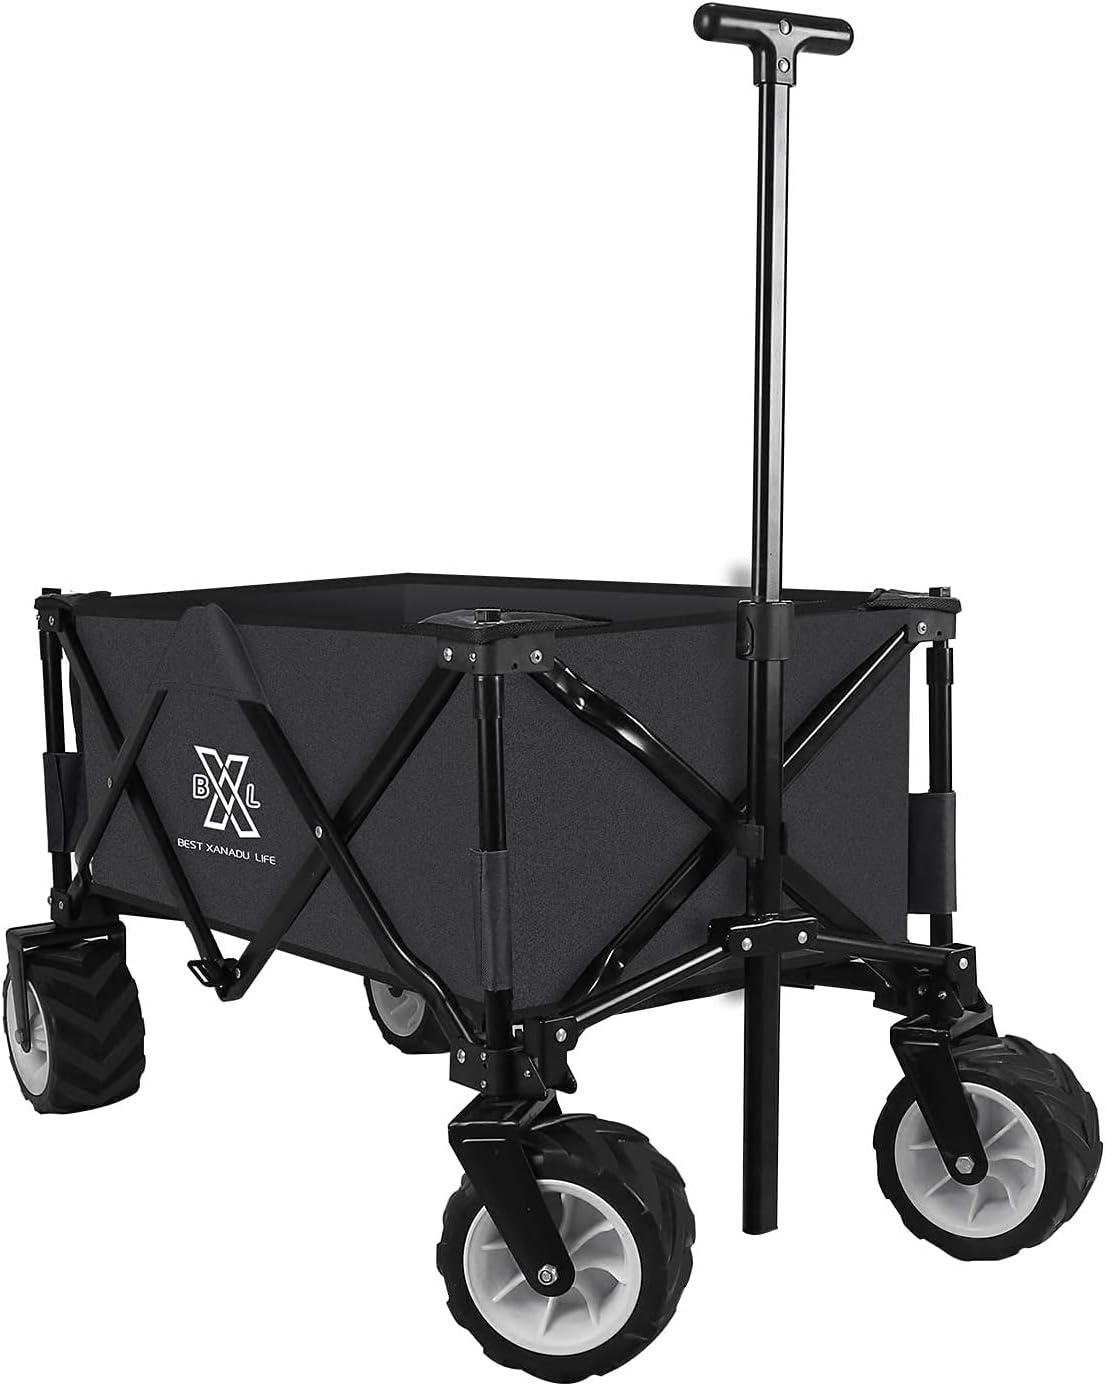 BXL Heavy Duty Collapsible Folding Wagon Phoenix Mall Utili Fixed price for sale Garden Cart Beach